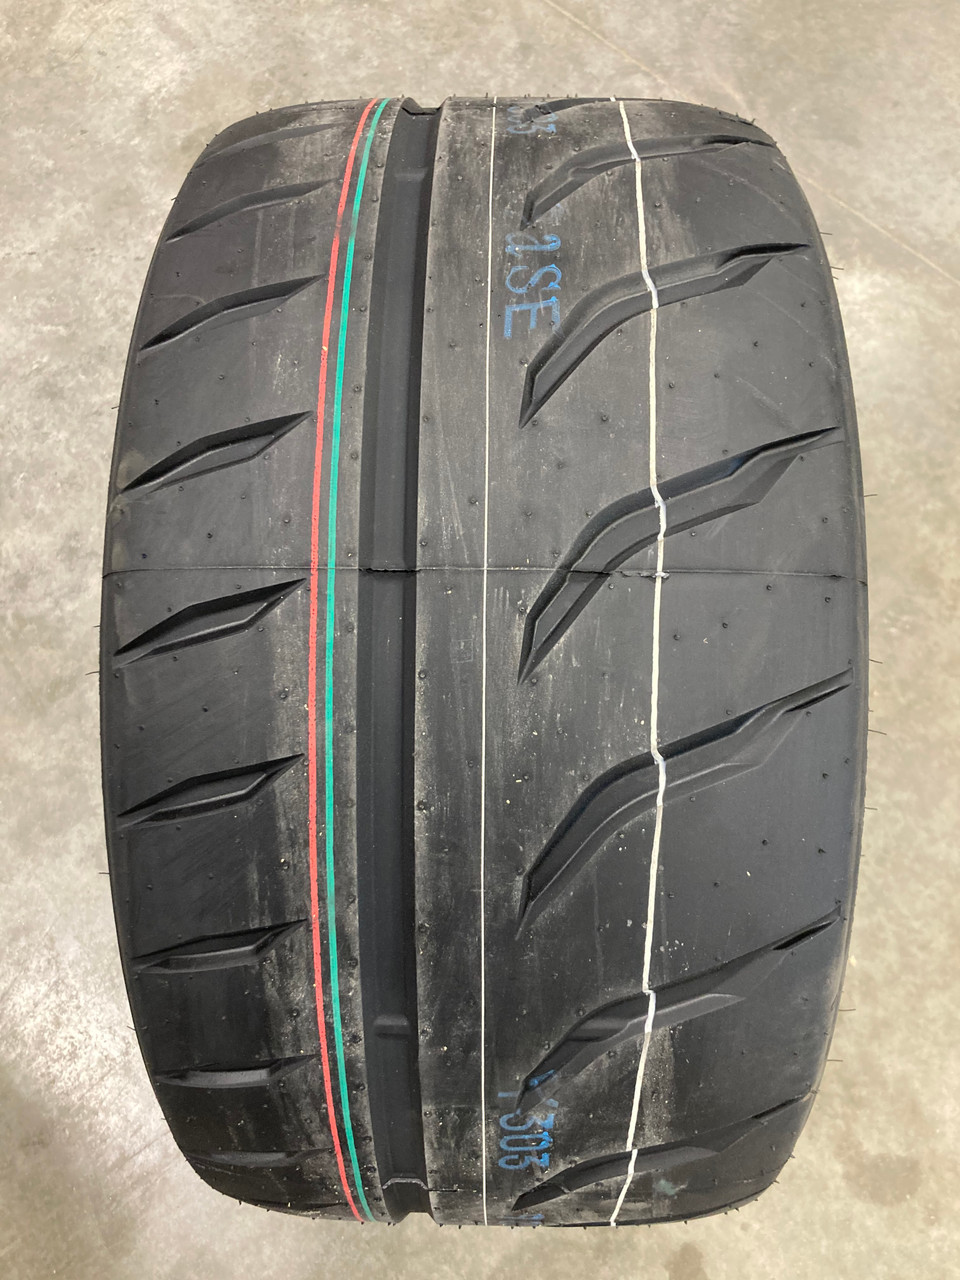 New Tire 315 30 18 Toyo Proxes R888R BSW 98Y 315/30ZR18 Street RR